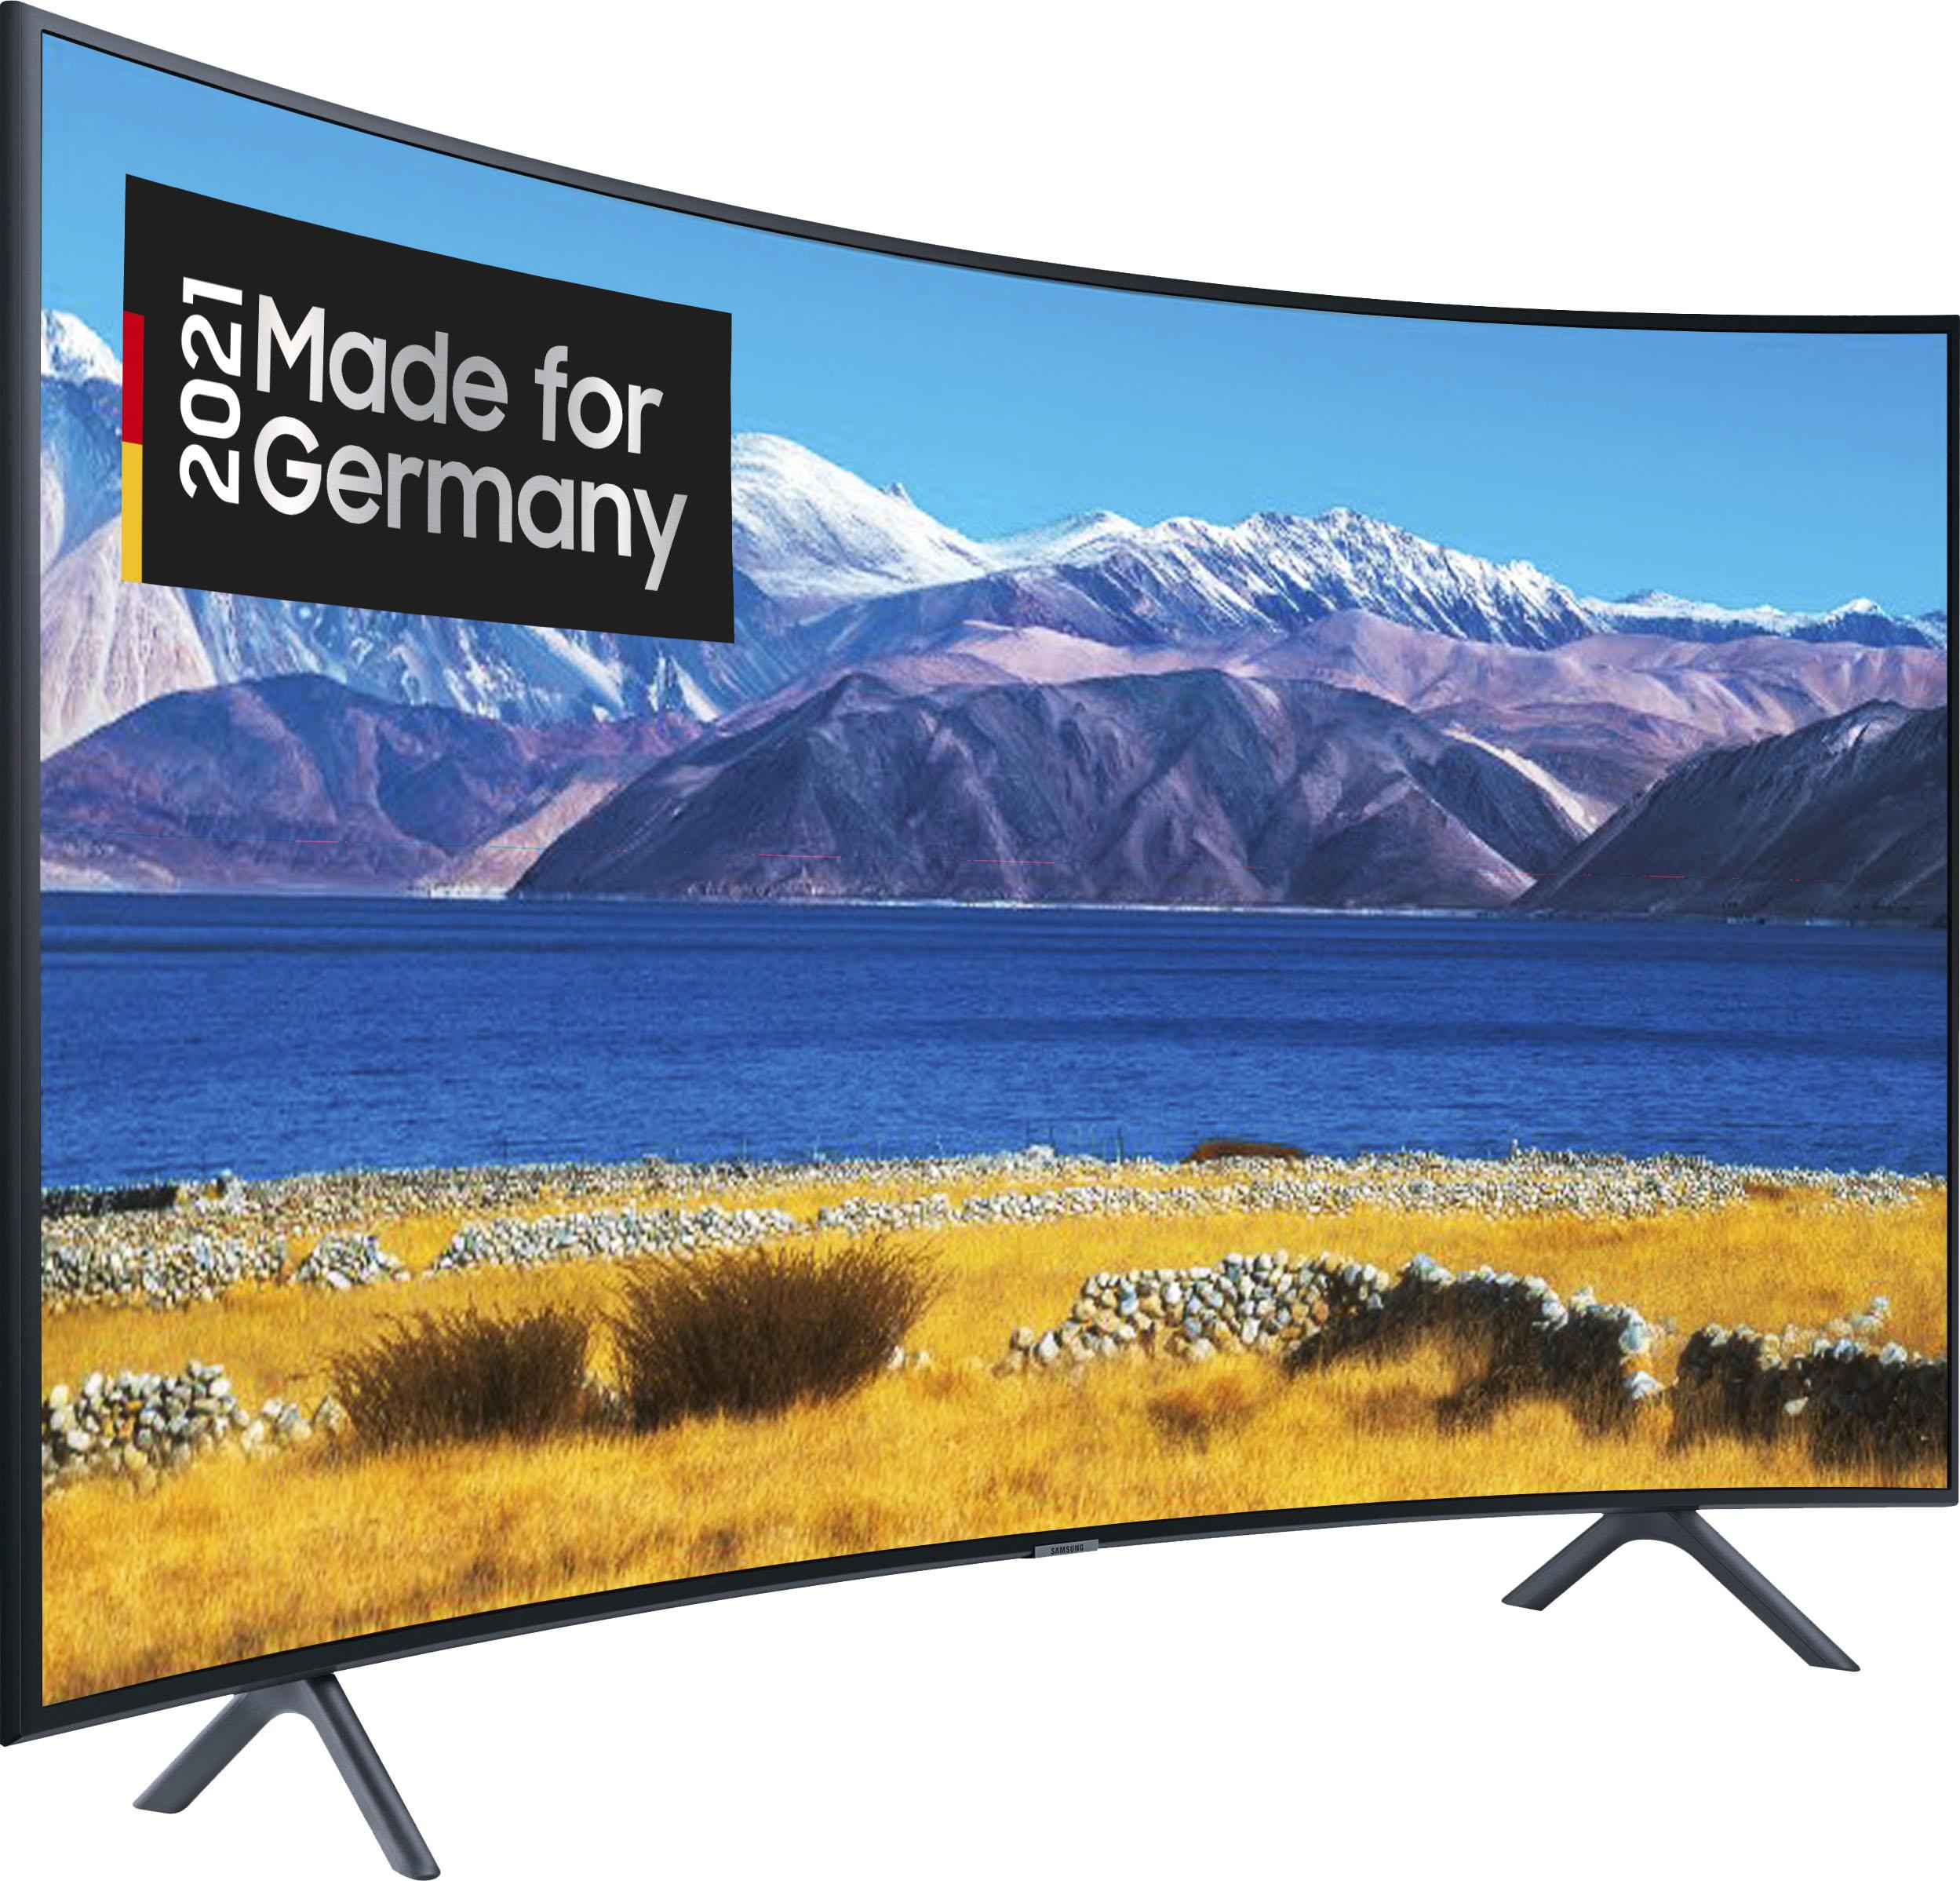 Samsung Curved-LED-Fernseher GU65TU8379U , 163 cm 65 , 4K Ultra HD, Smart-TV